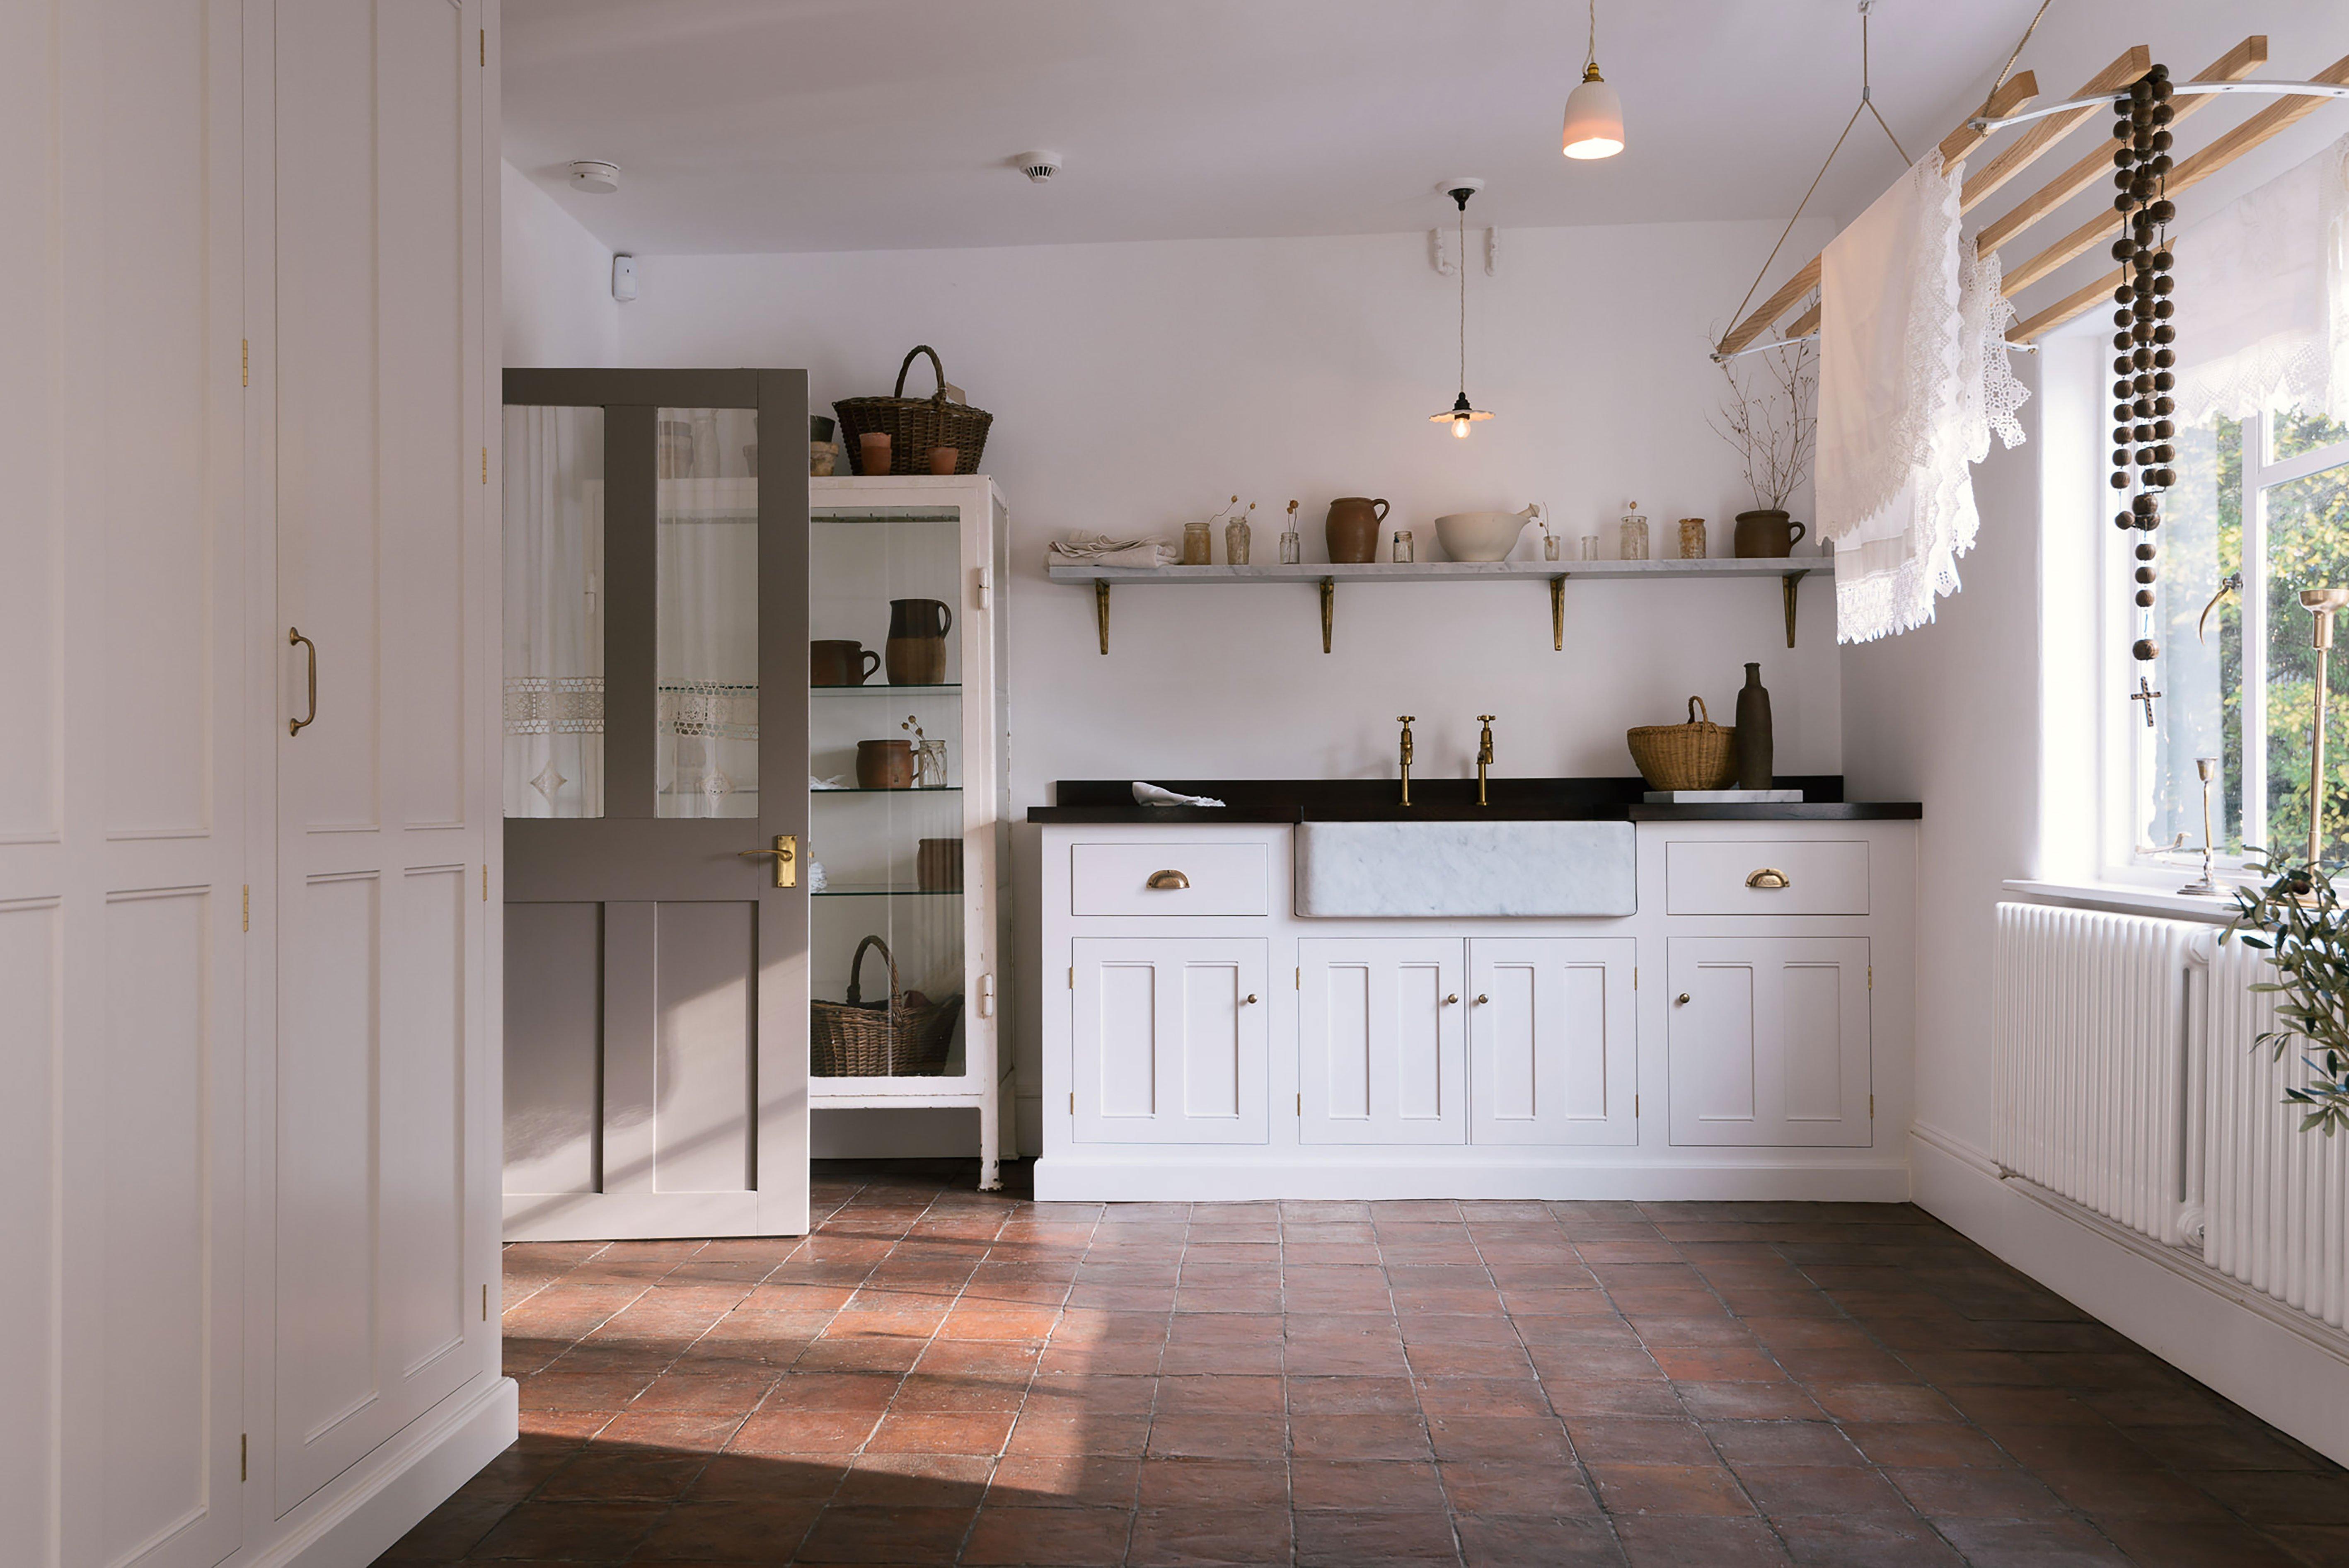 2019 Stone Flooring Trends - Terracotta Floor Tiles - KleanSTONE Stone Floor Cleaning